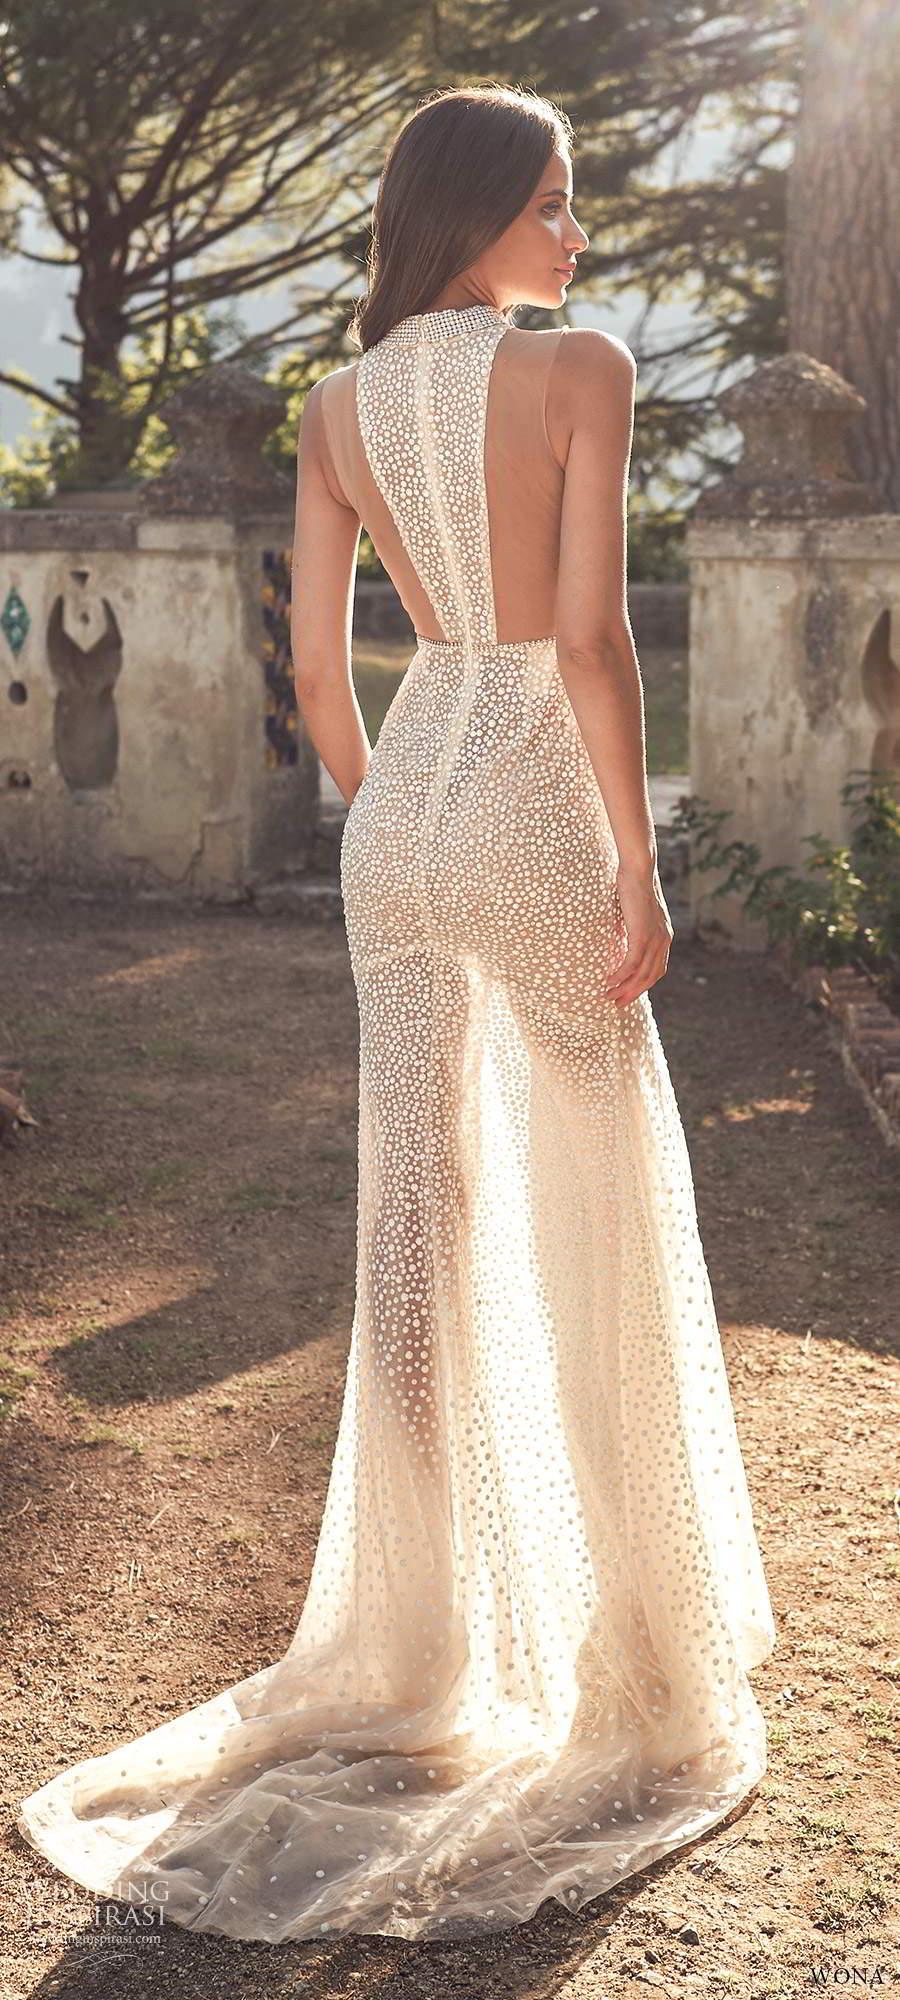 wona fall 2020 bridal sleeveless high halter neckline keyhole bodice fully embellished sheath wedding dress slit skirt chapel train (14) bv